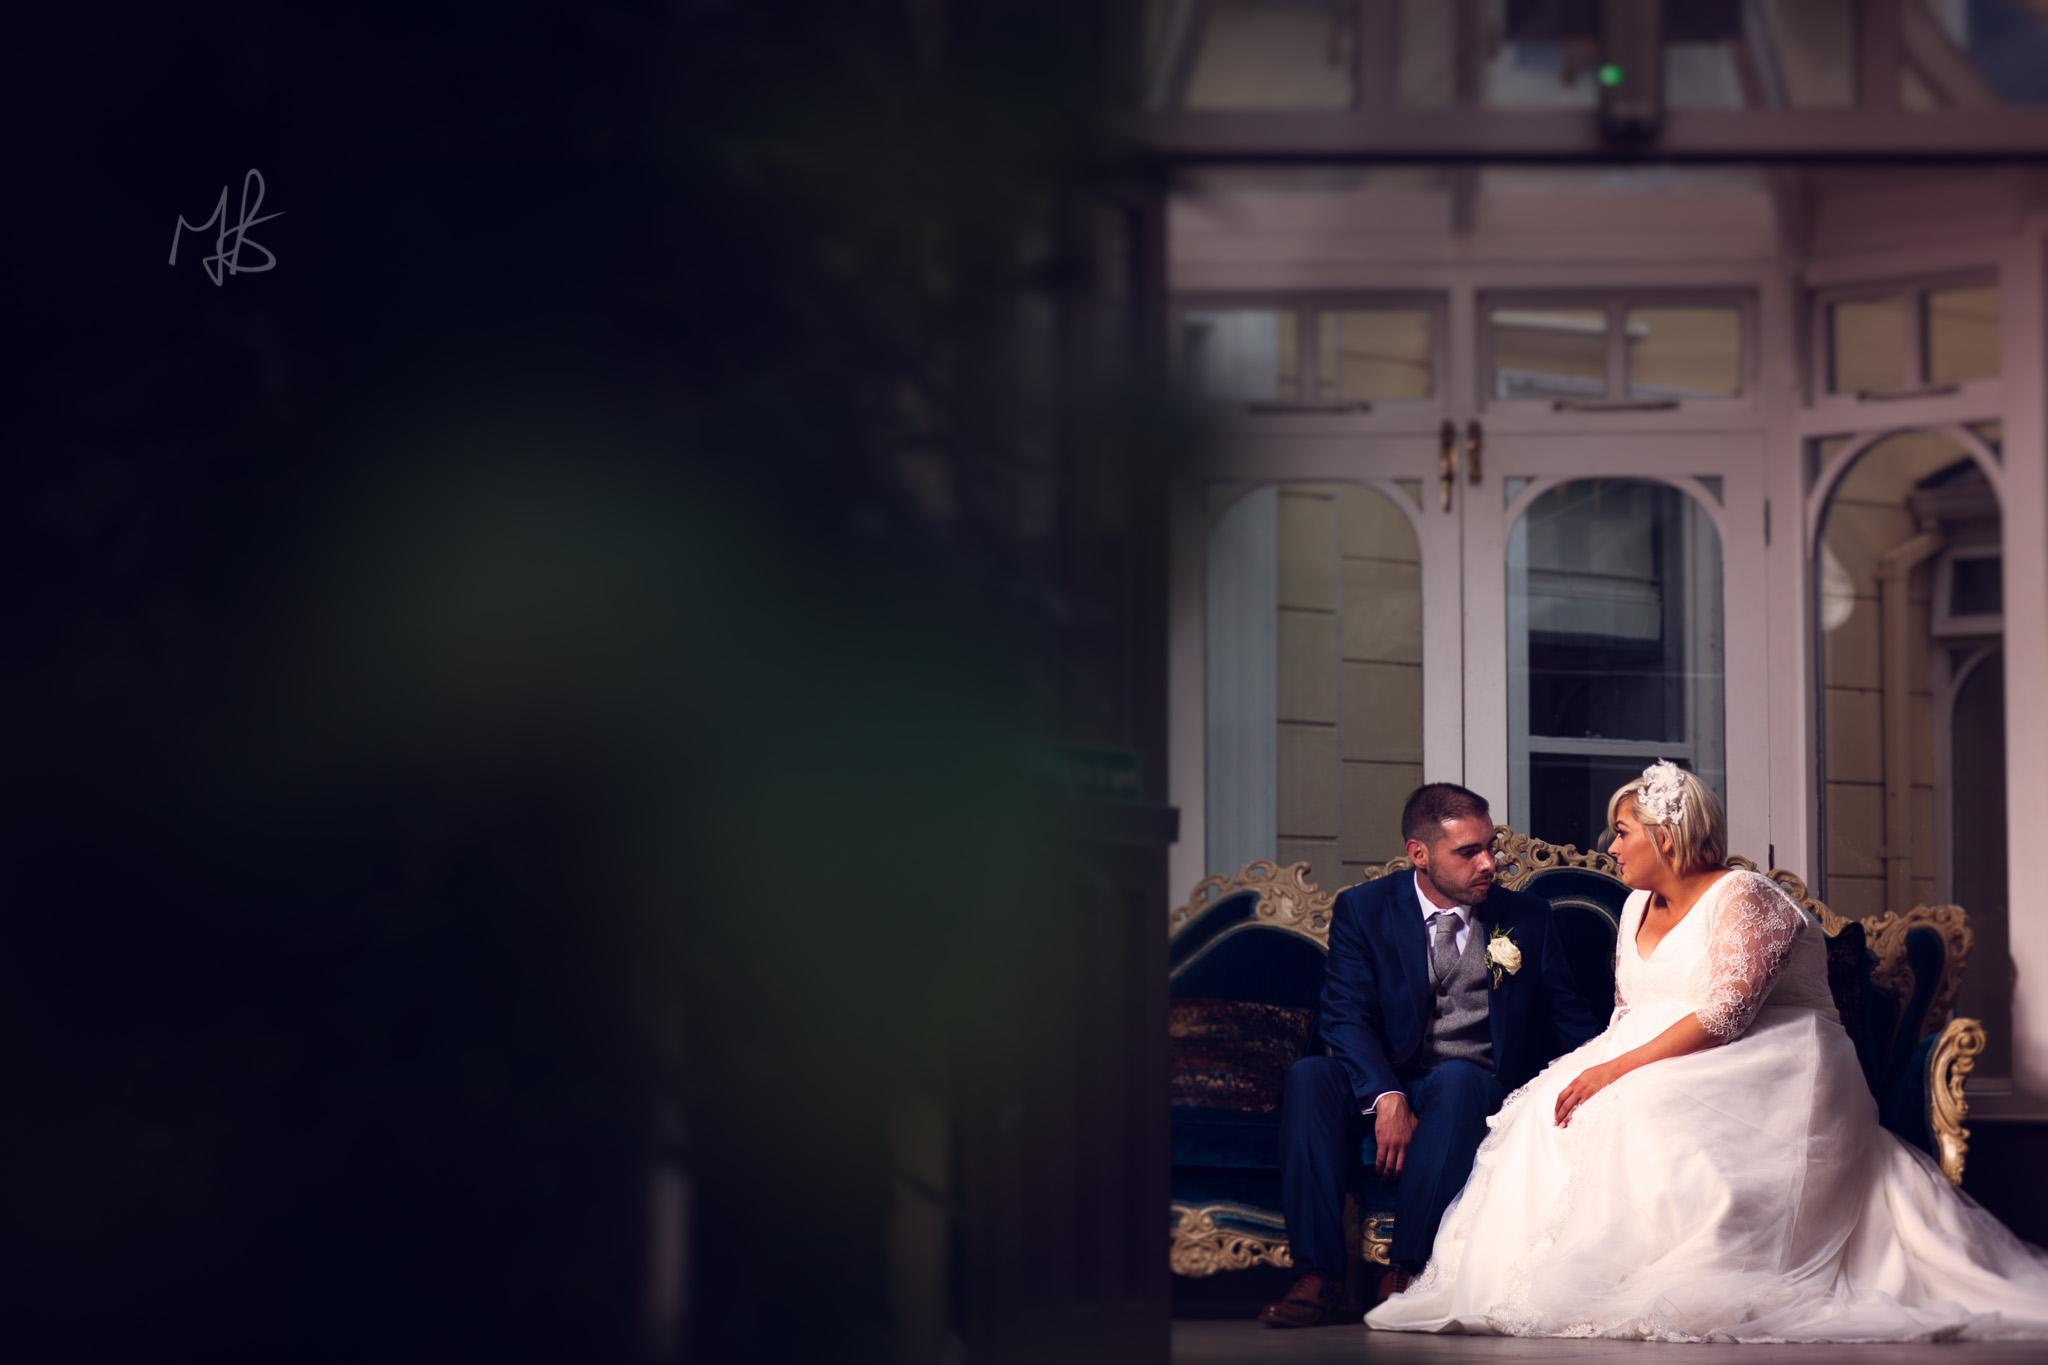 Northern-Ireland-Wedding-Photographer-Mark-Barnes-Ballymena_wedding-photography-Leighinmohr-House-Seamas_Alanna_For-web-48.jpg